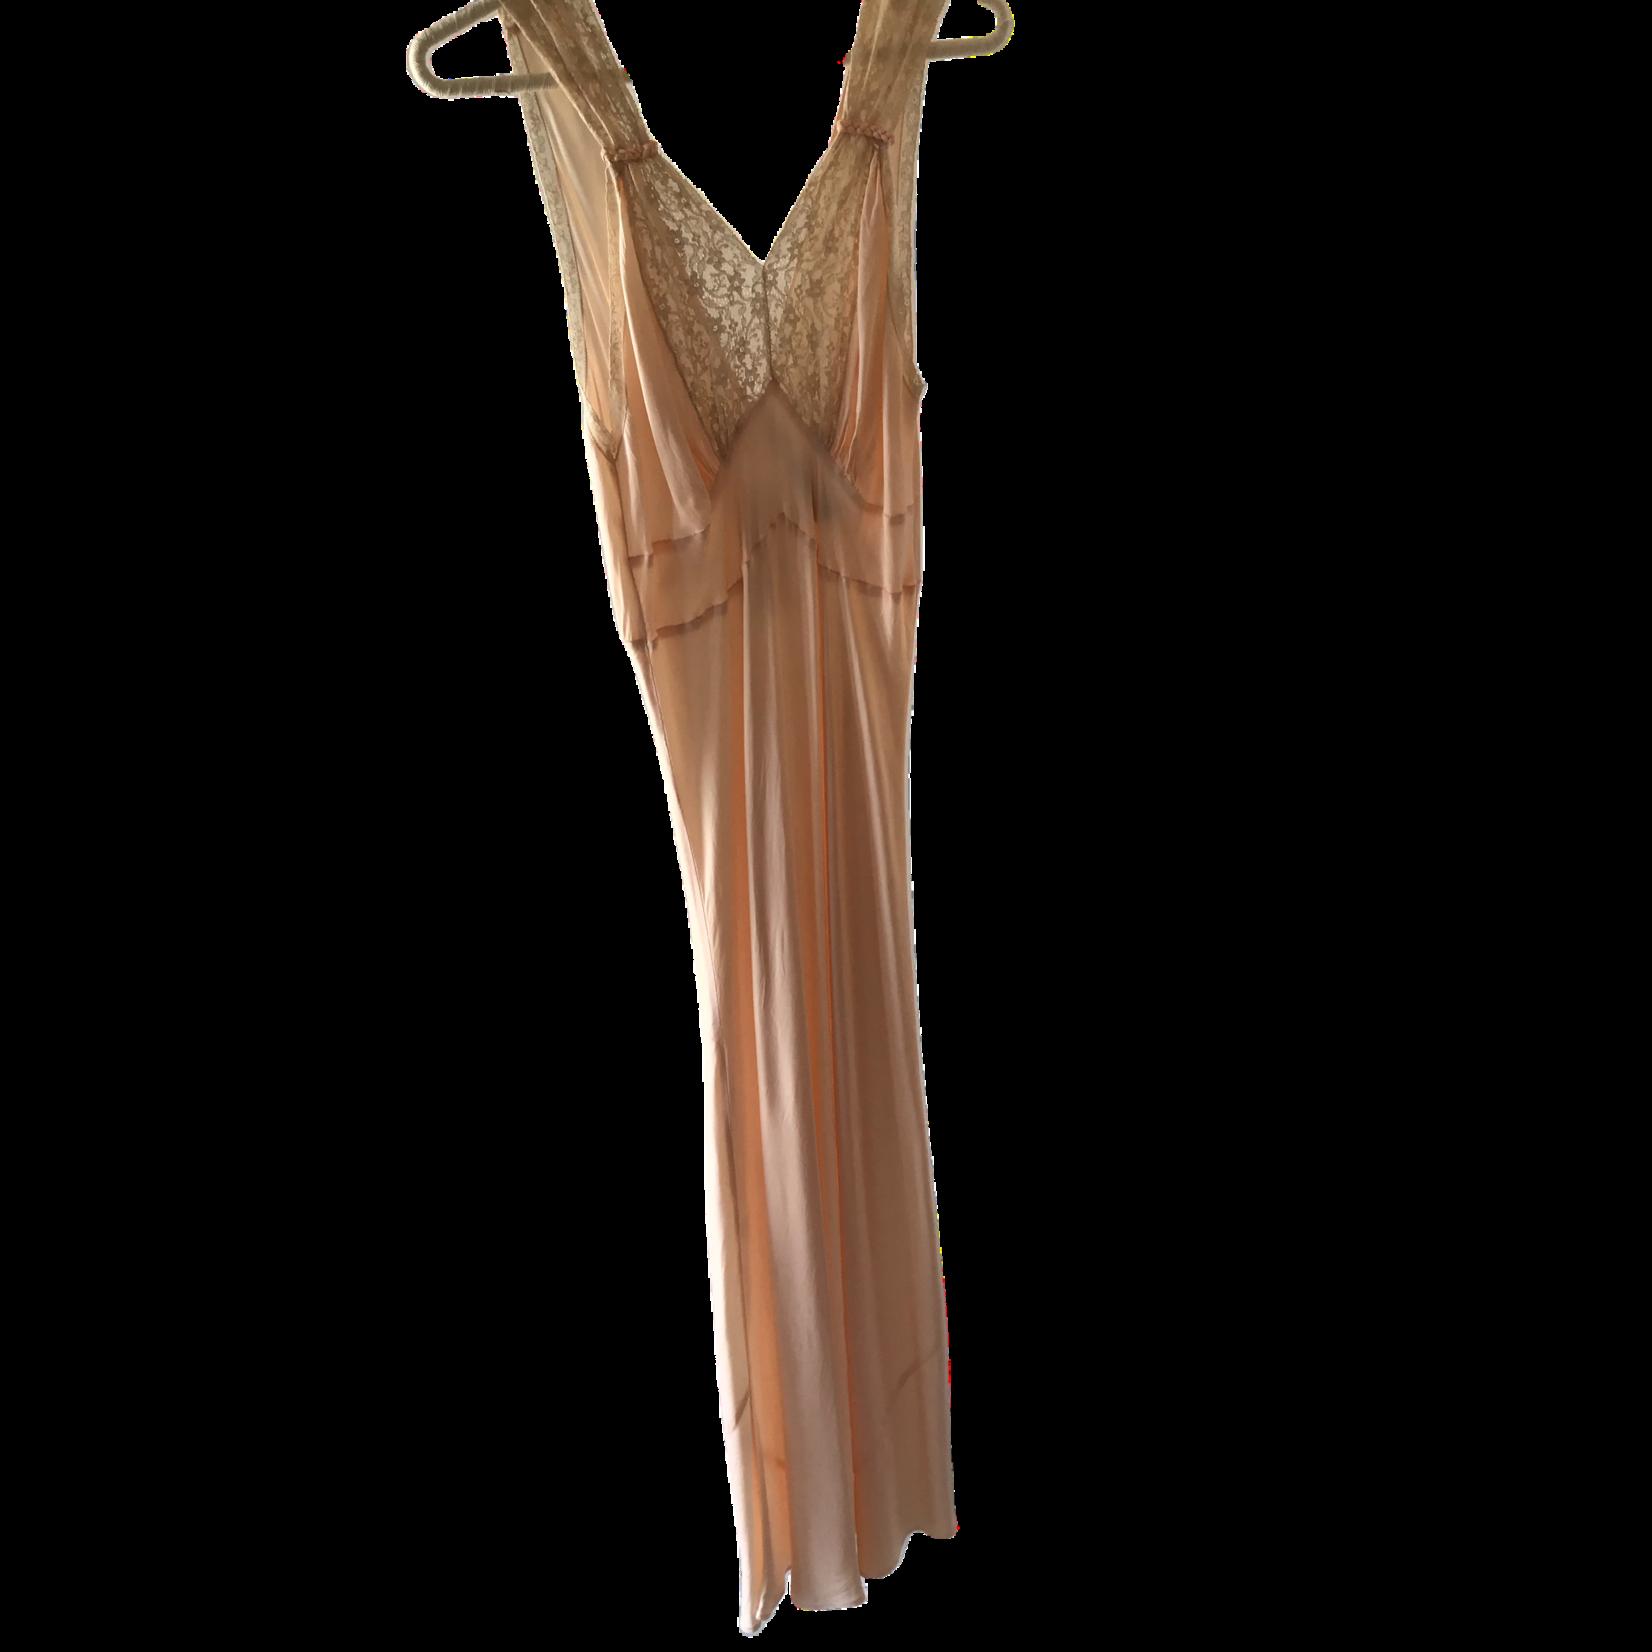 1940s Blush Pink Bias Cut Rayon & Lace Slip Dress SL9ON33730